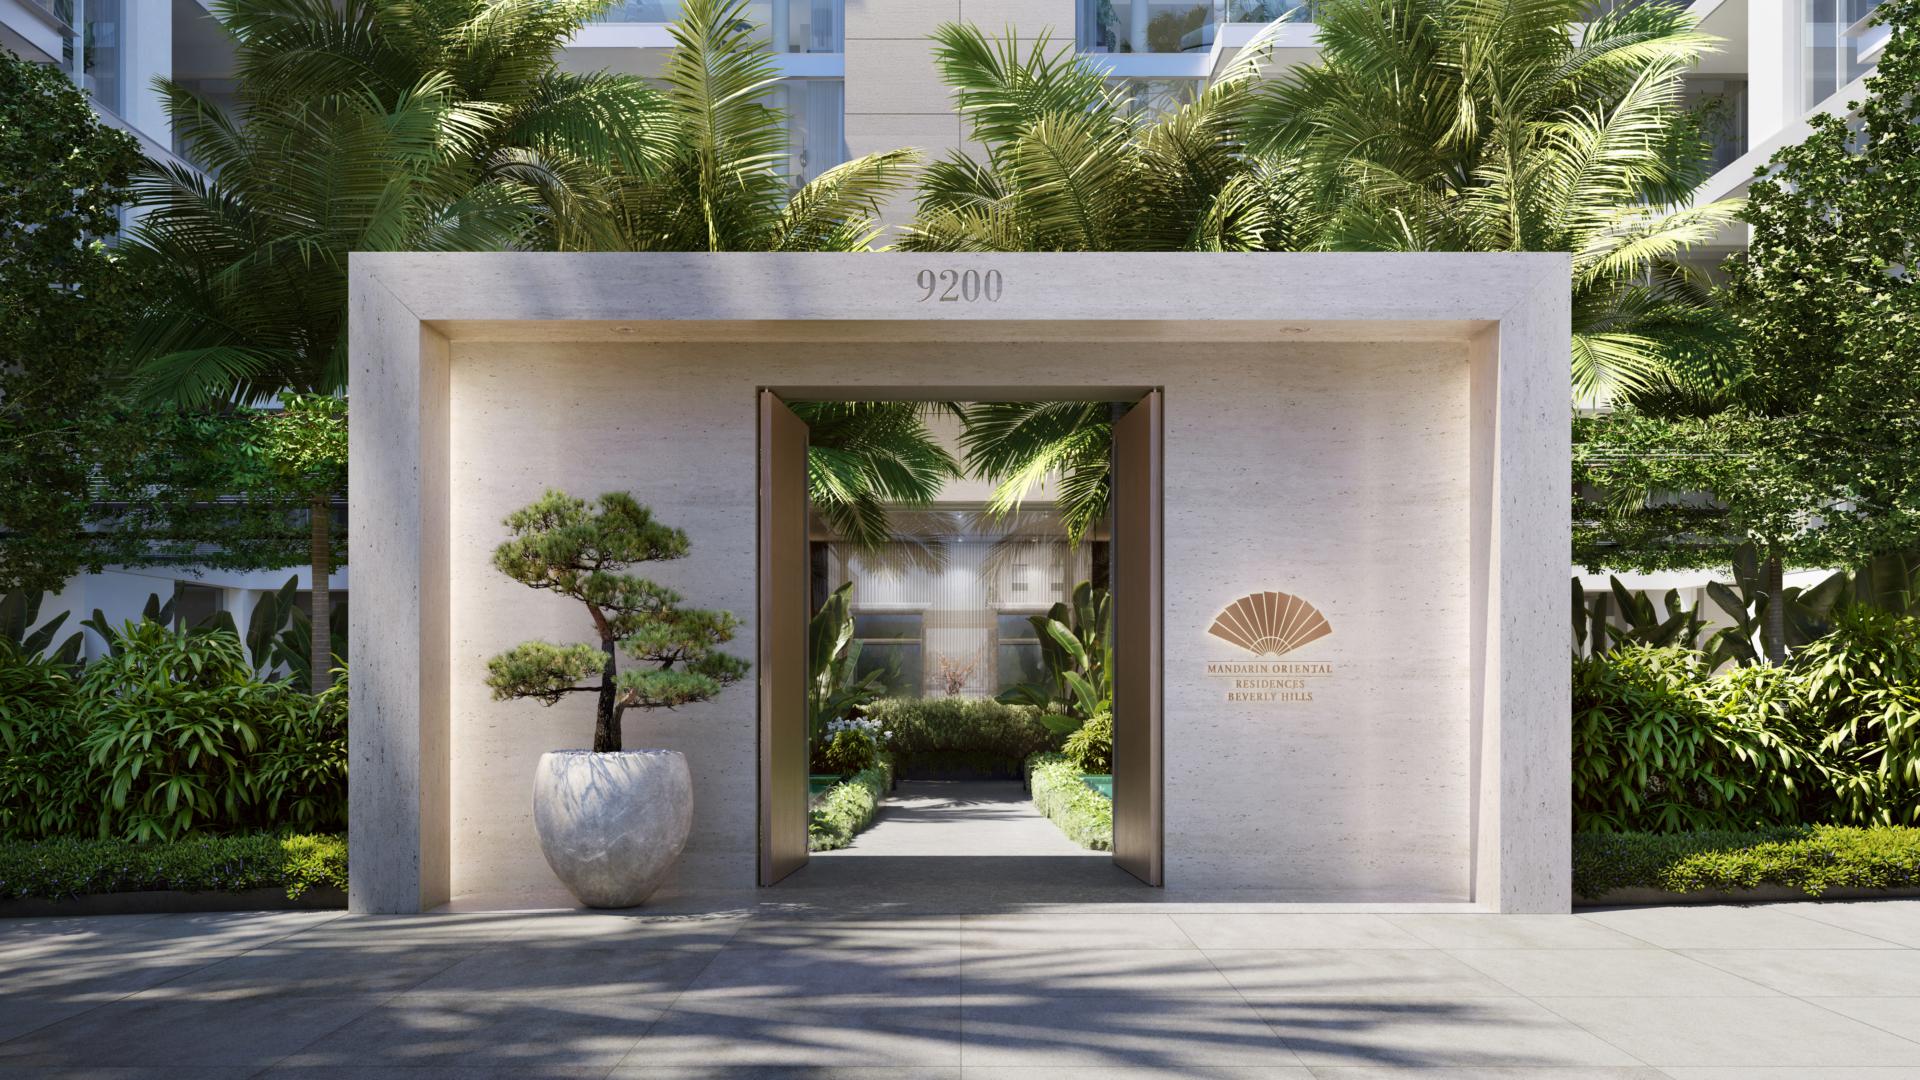 LTI票選入門奢華飯店品牌―Mandrin Oriental獨立住宅即將迎妳入厝